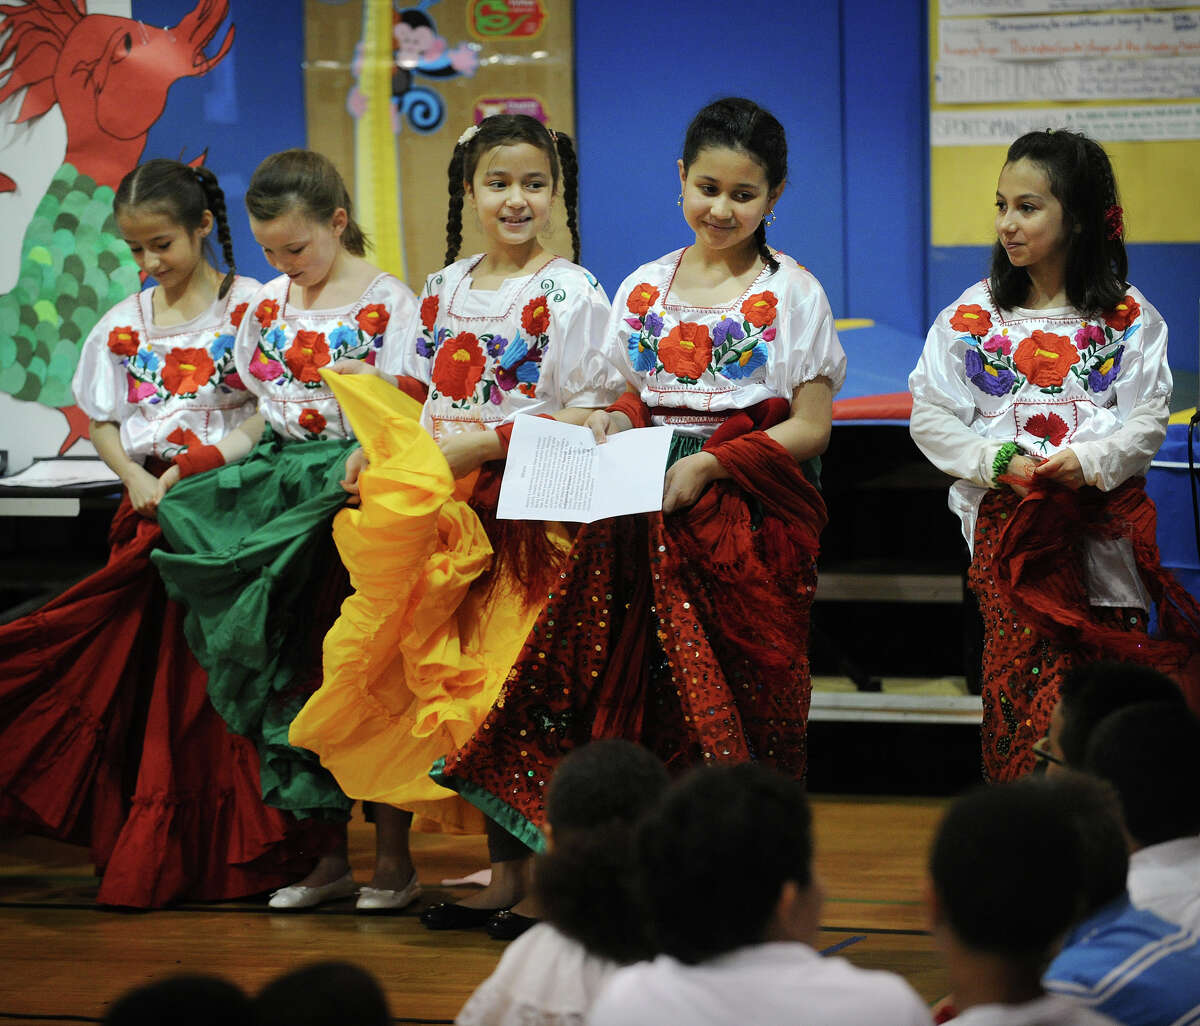 Norwalk Mexican population: 4.0 percentSource: U.S. Census